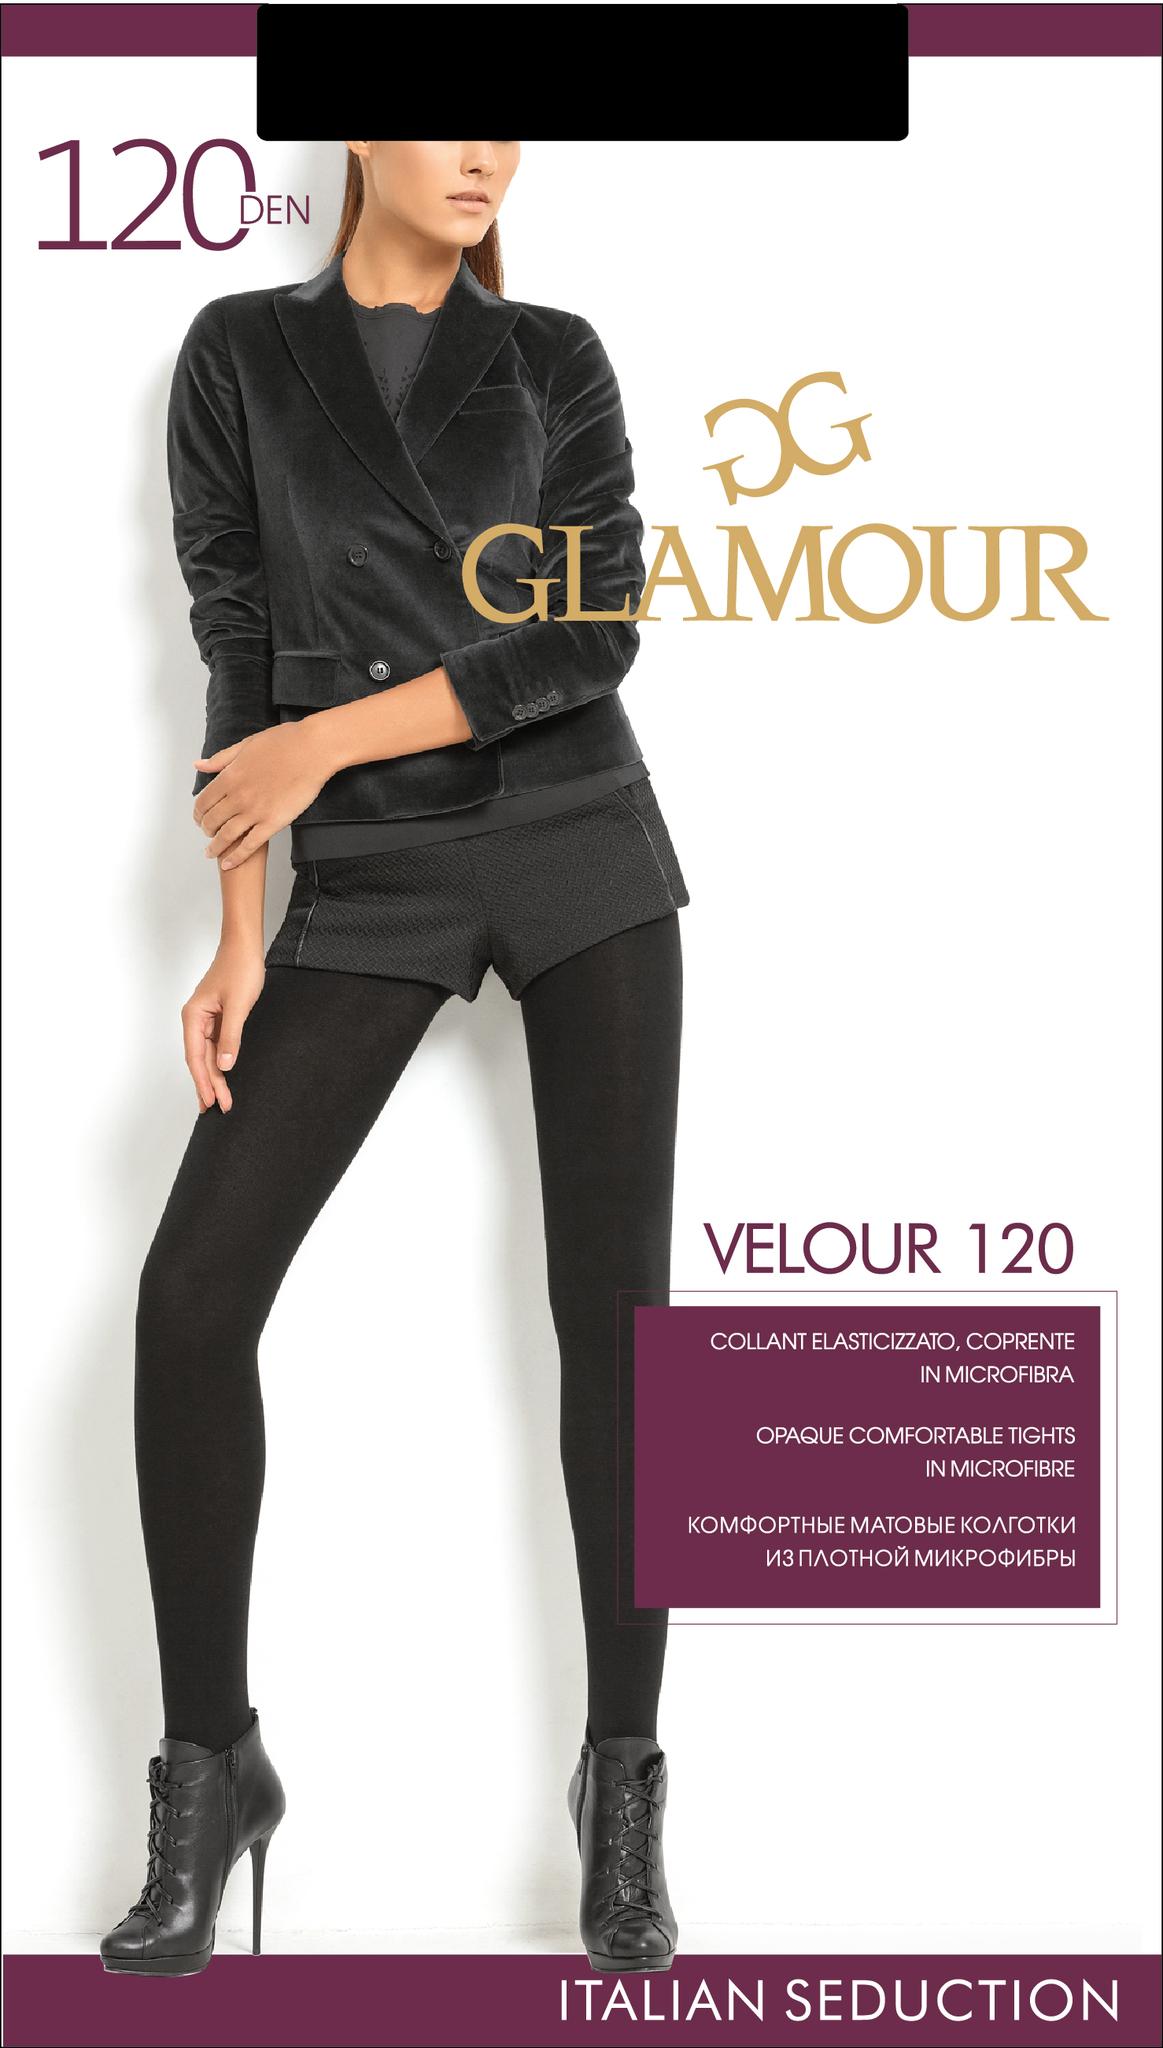 Glamour VELOUR 120 колготки женские